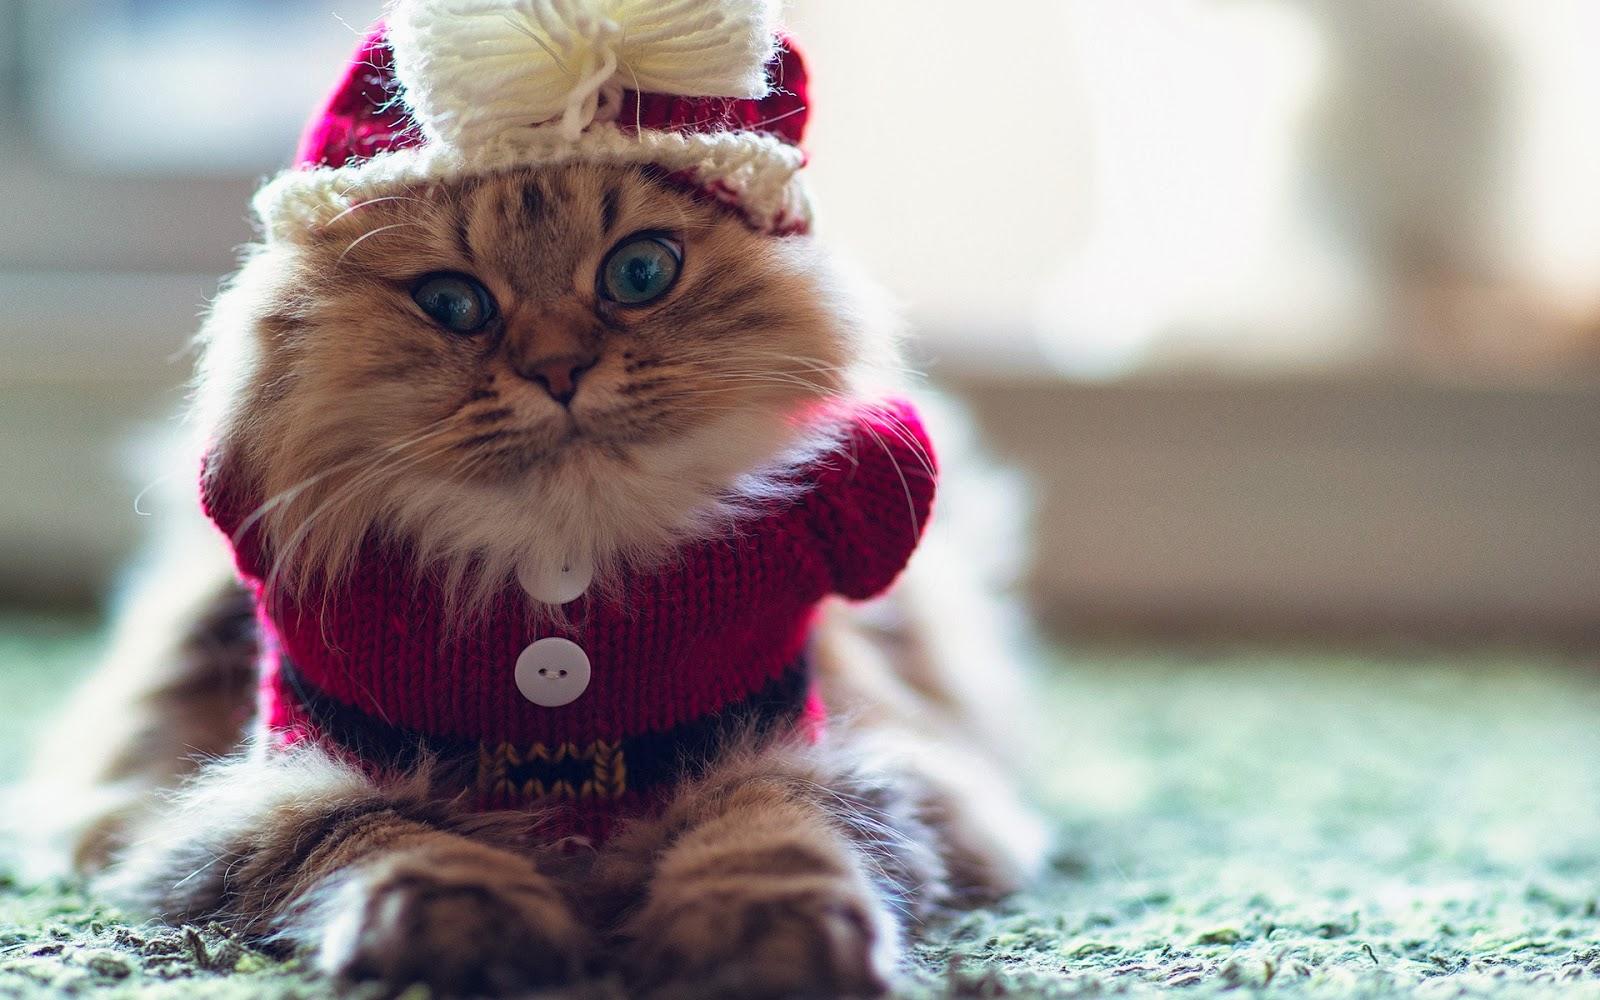 wallpaper-lucu-kucing-musim dingin-foto-lucu-wallpaper-1920x1200